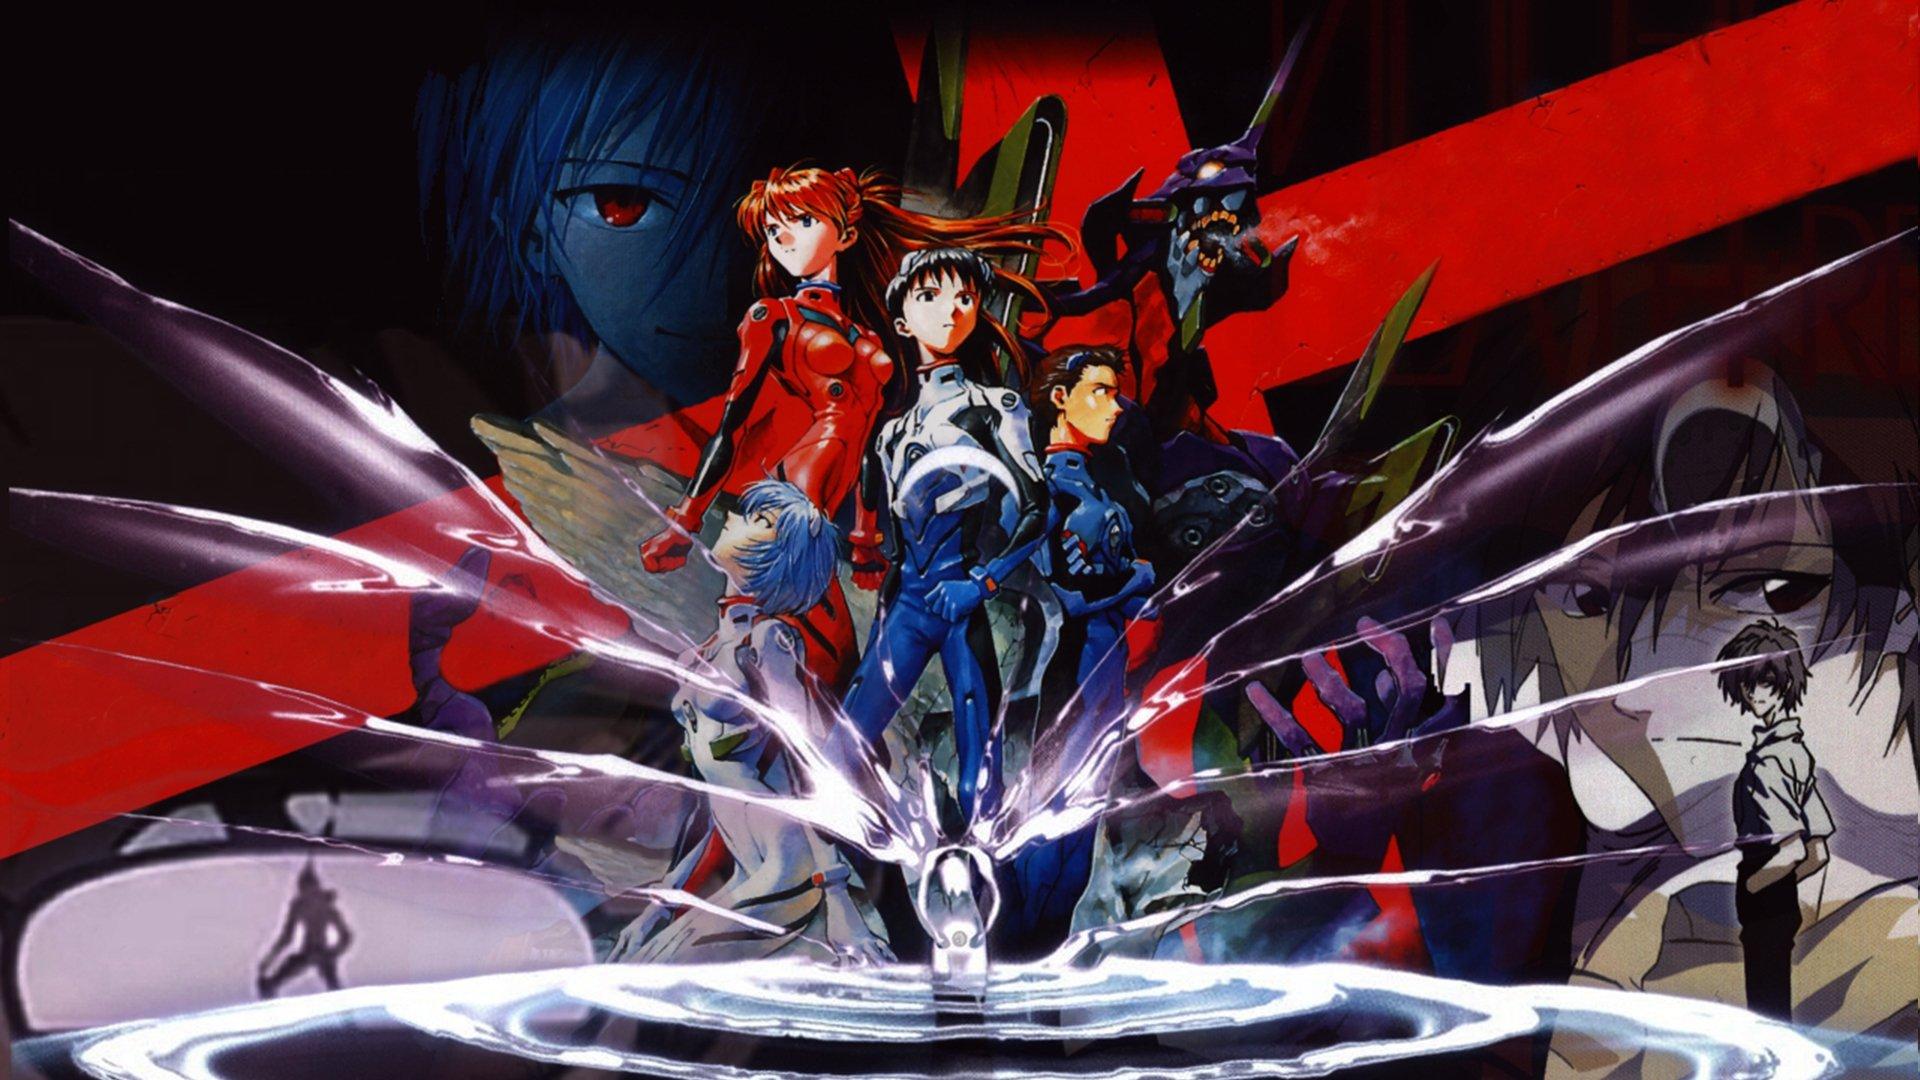 Neon Genesis Evangelion Hd Wallpaper Background Image